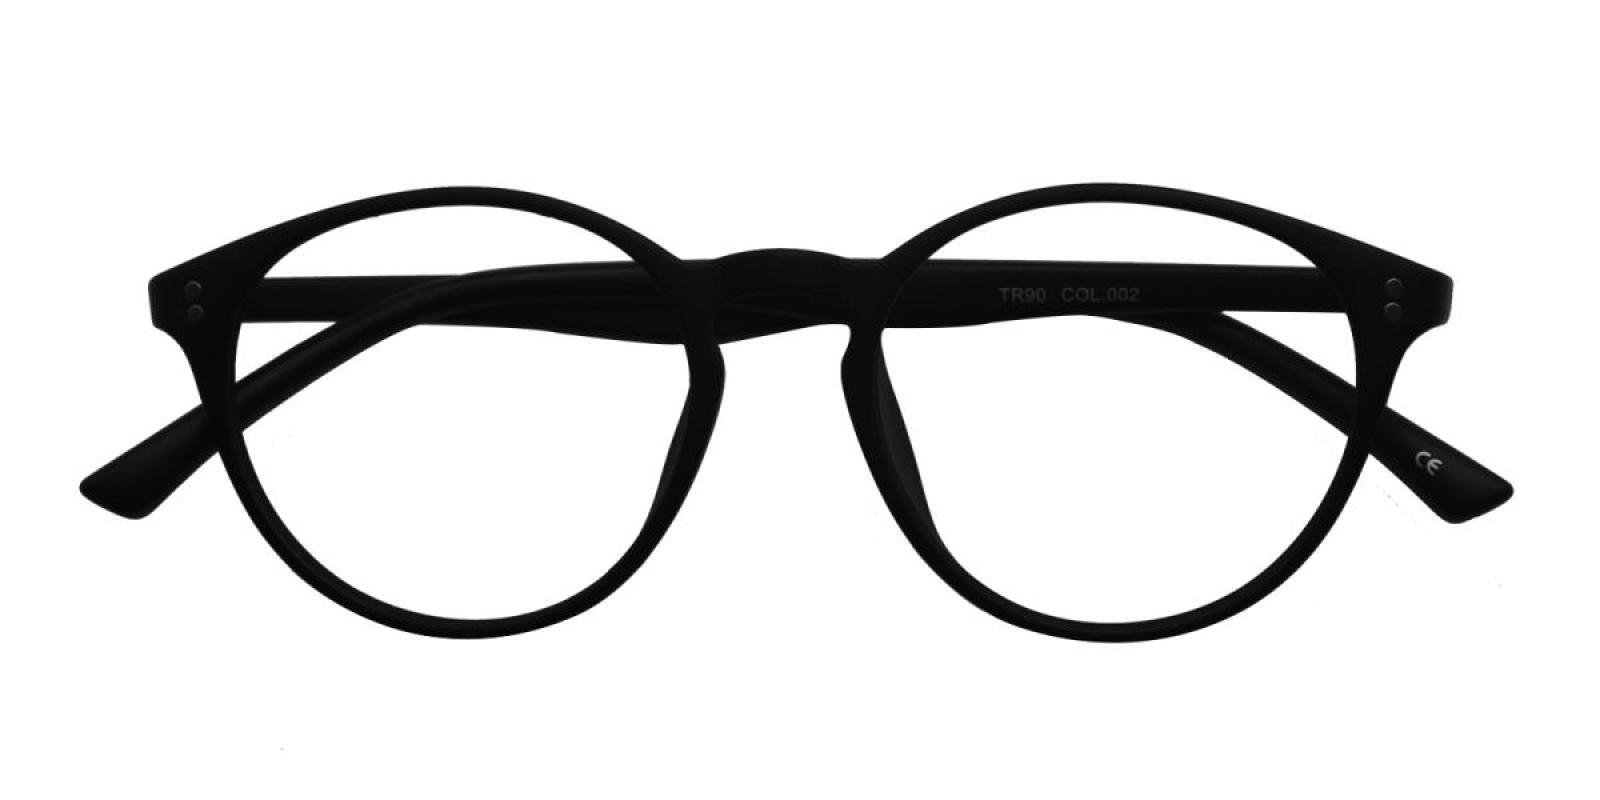 Morning-Black-Round-TR-Eyeglasses-detail